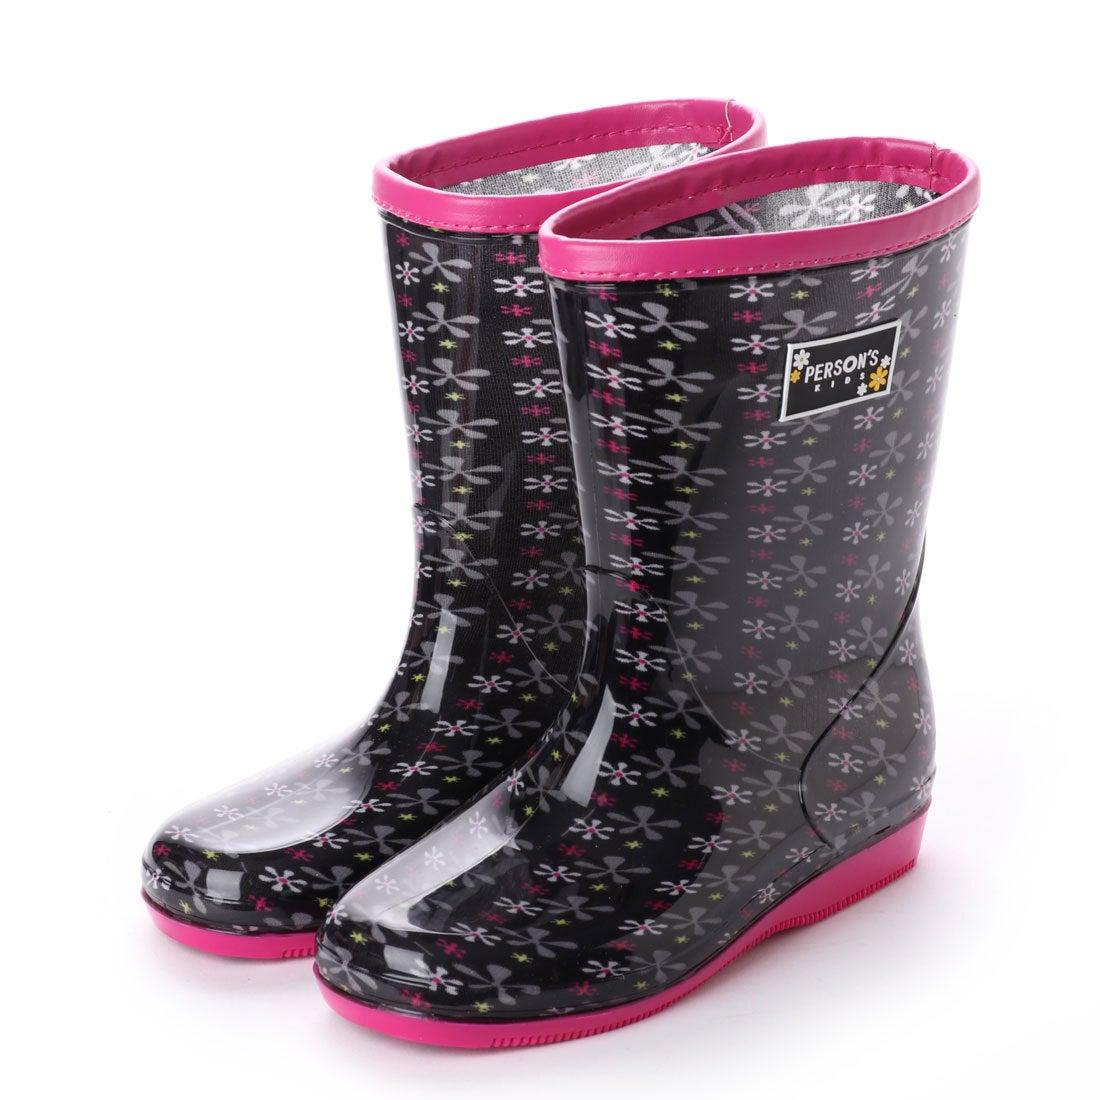 c3a2281797dd2 パーソンズキッズ PERSON S KIDS レインブーツ 長靴 (BLK) -靴&ファッション通販 ロコンド〜自宅で試着、気軽に返品